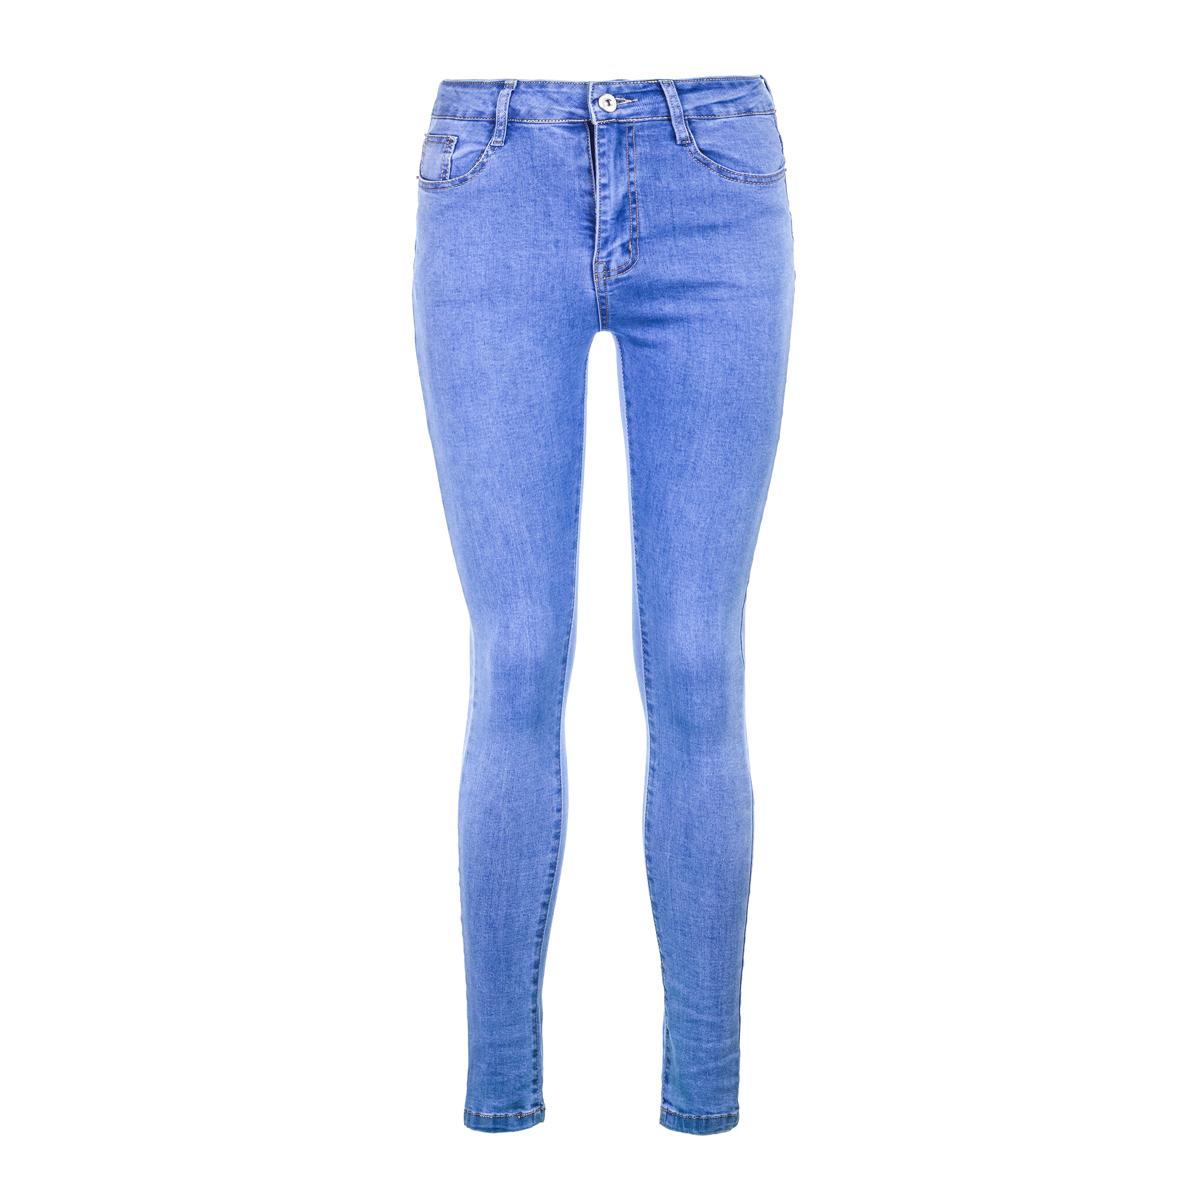 Жен. джинсы арт. 12-0155 Голубой р. 26 фото